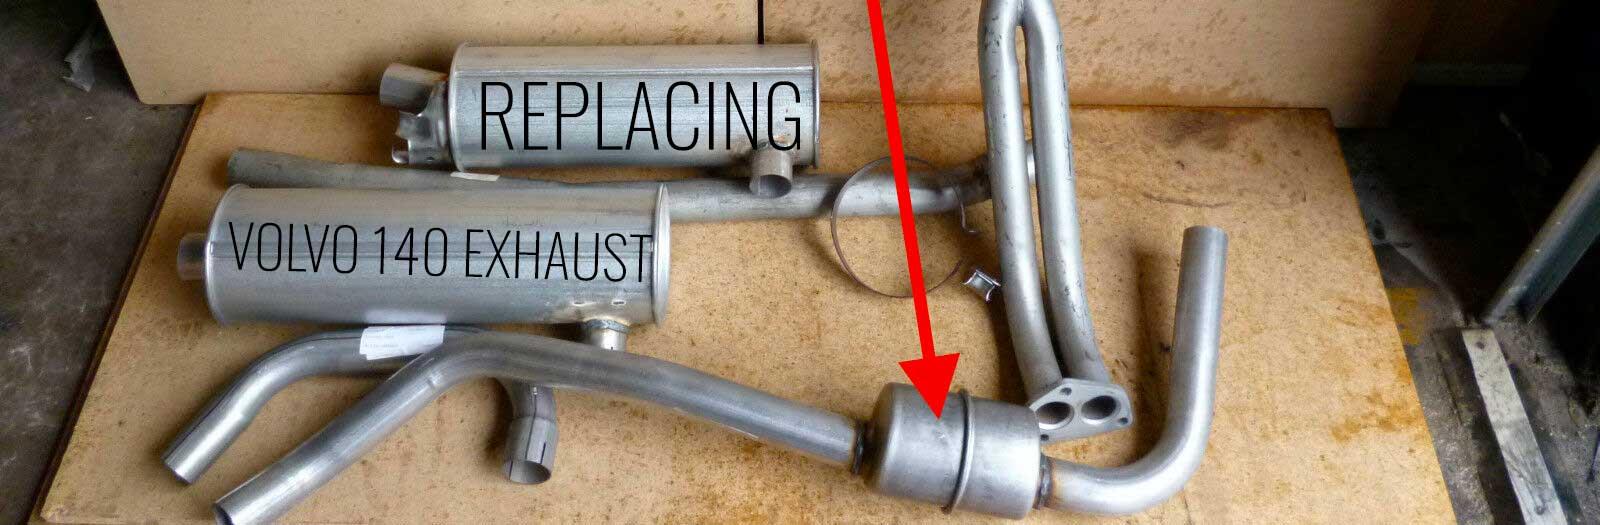 Replacing Volvo 140 Exhaust -